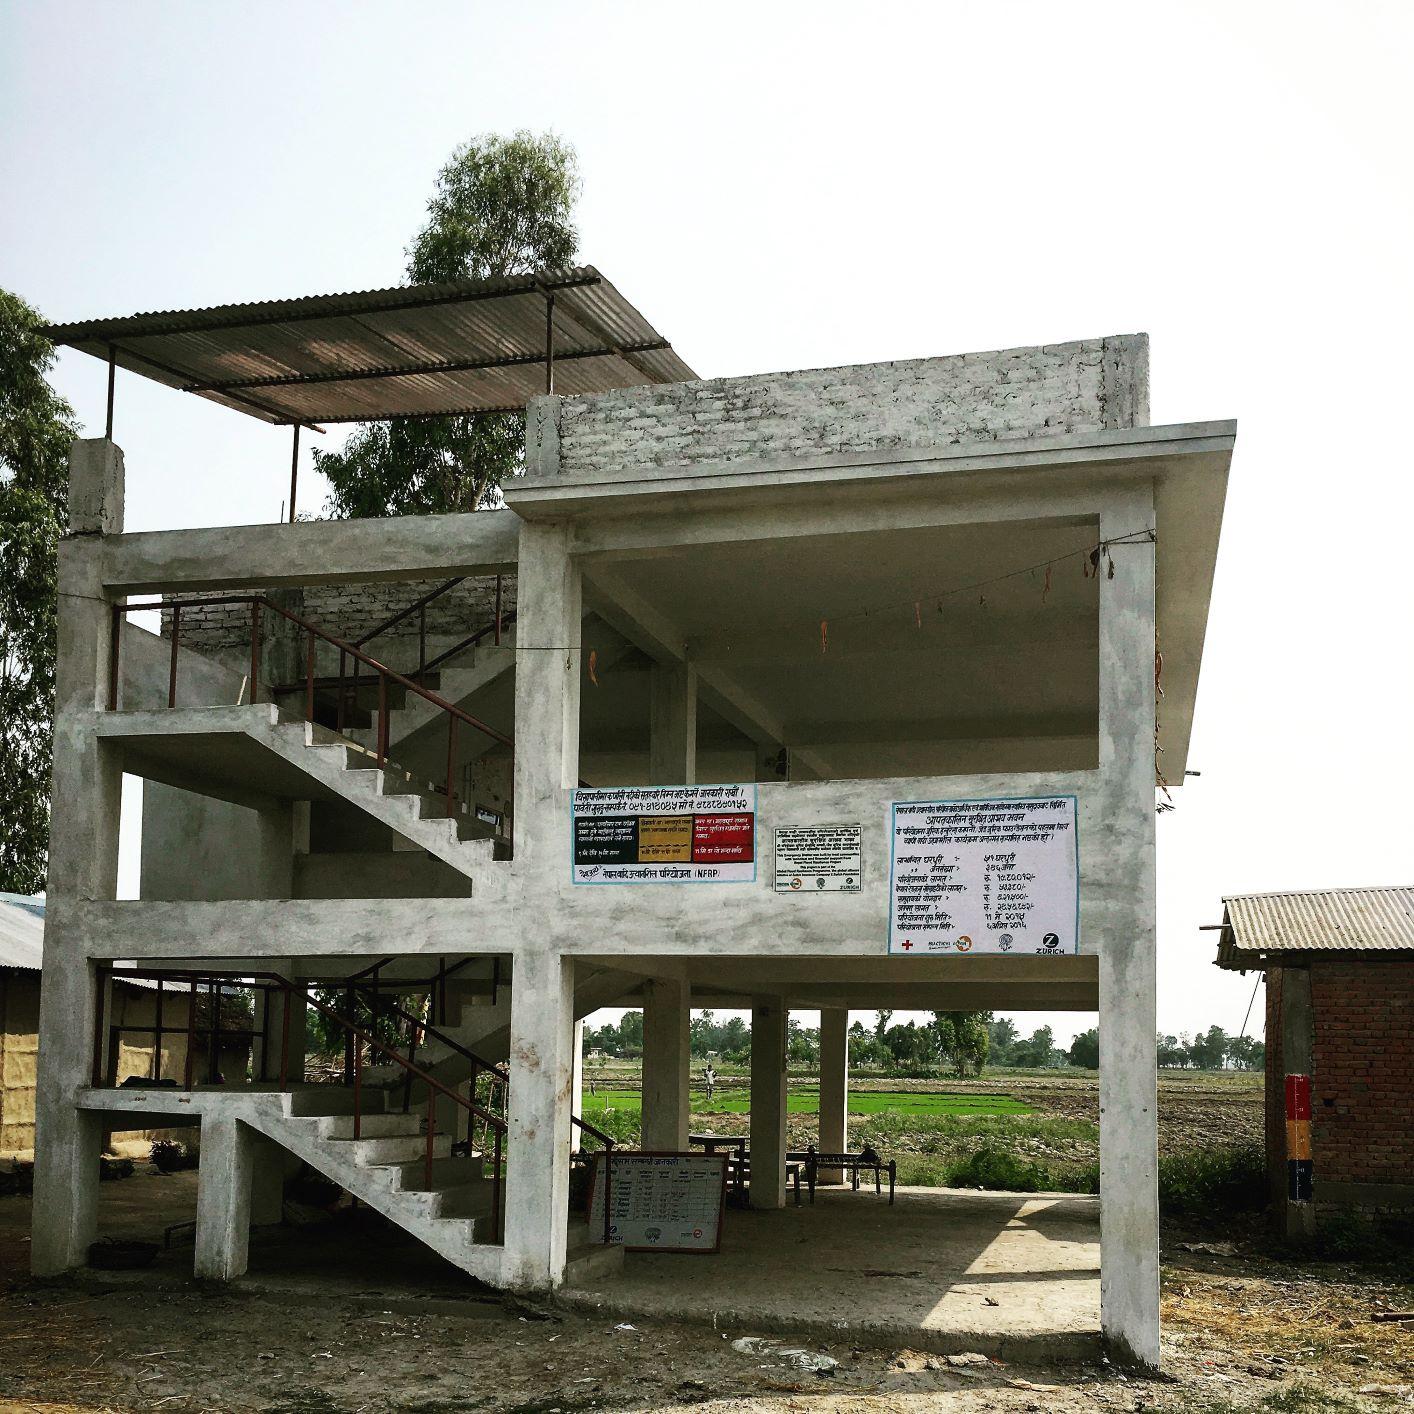 Refugio de evacuación en Nepal. Por Archana Gurung, Practical Action